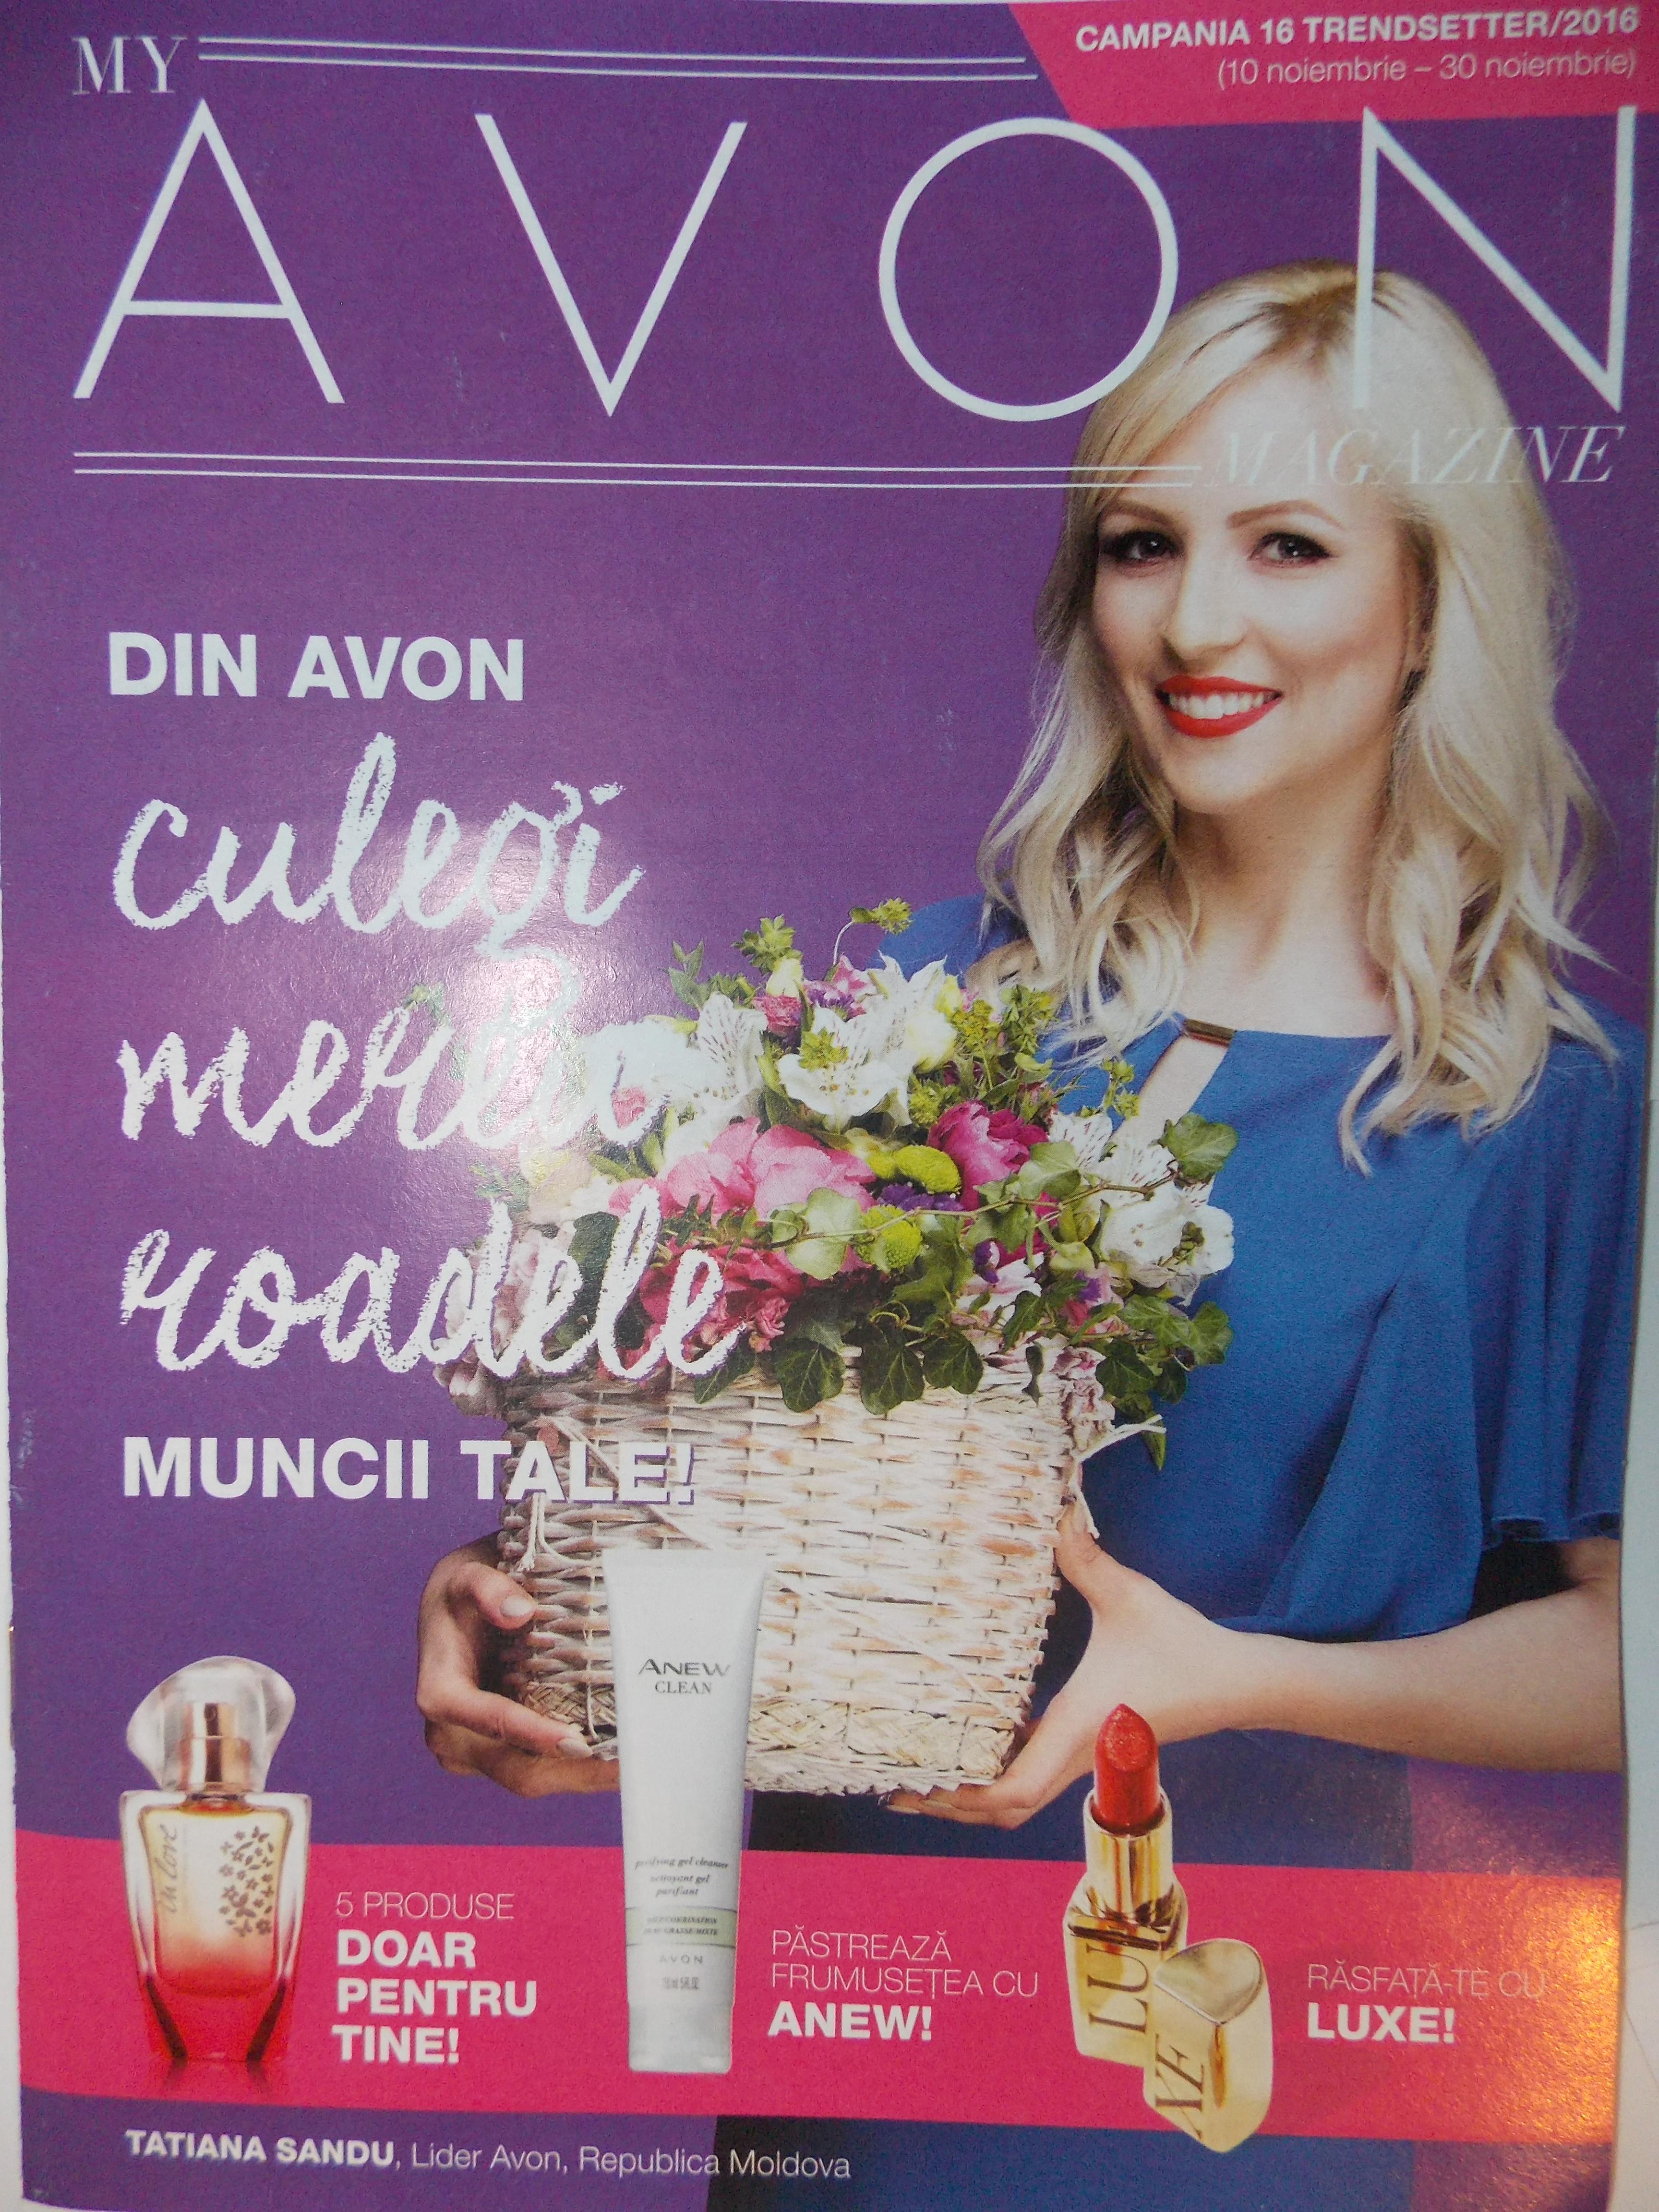 Catalog My Avon Magazine Campania 16 2016 - Catalog AZ